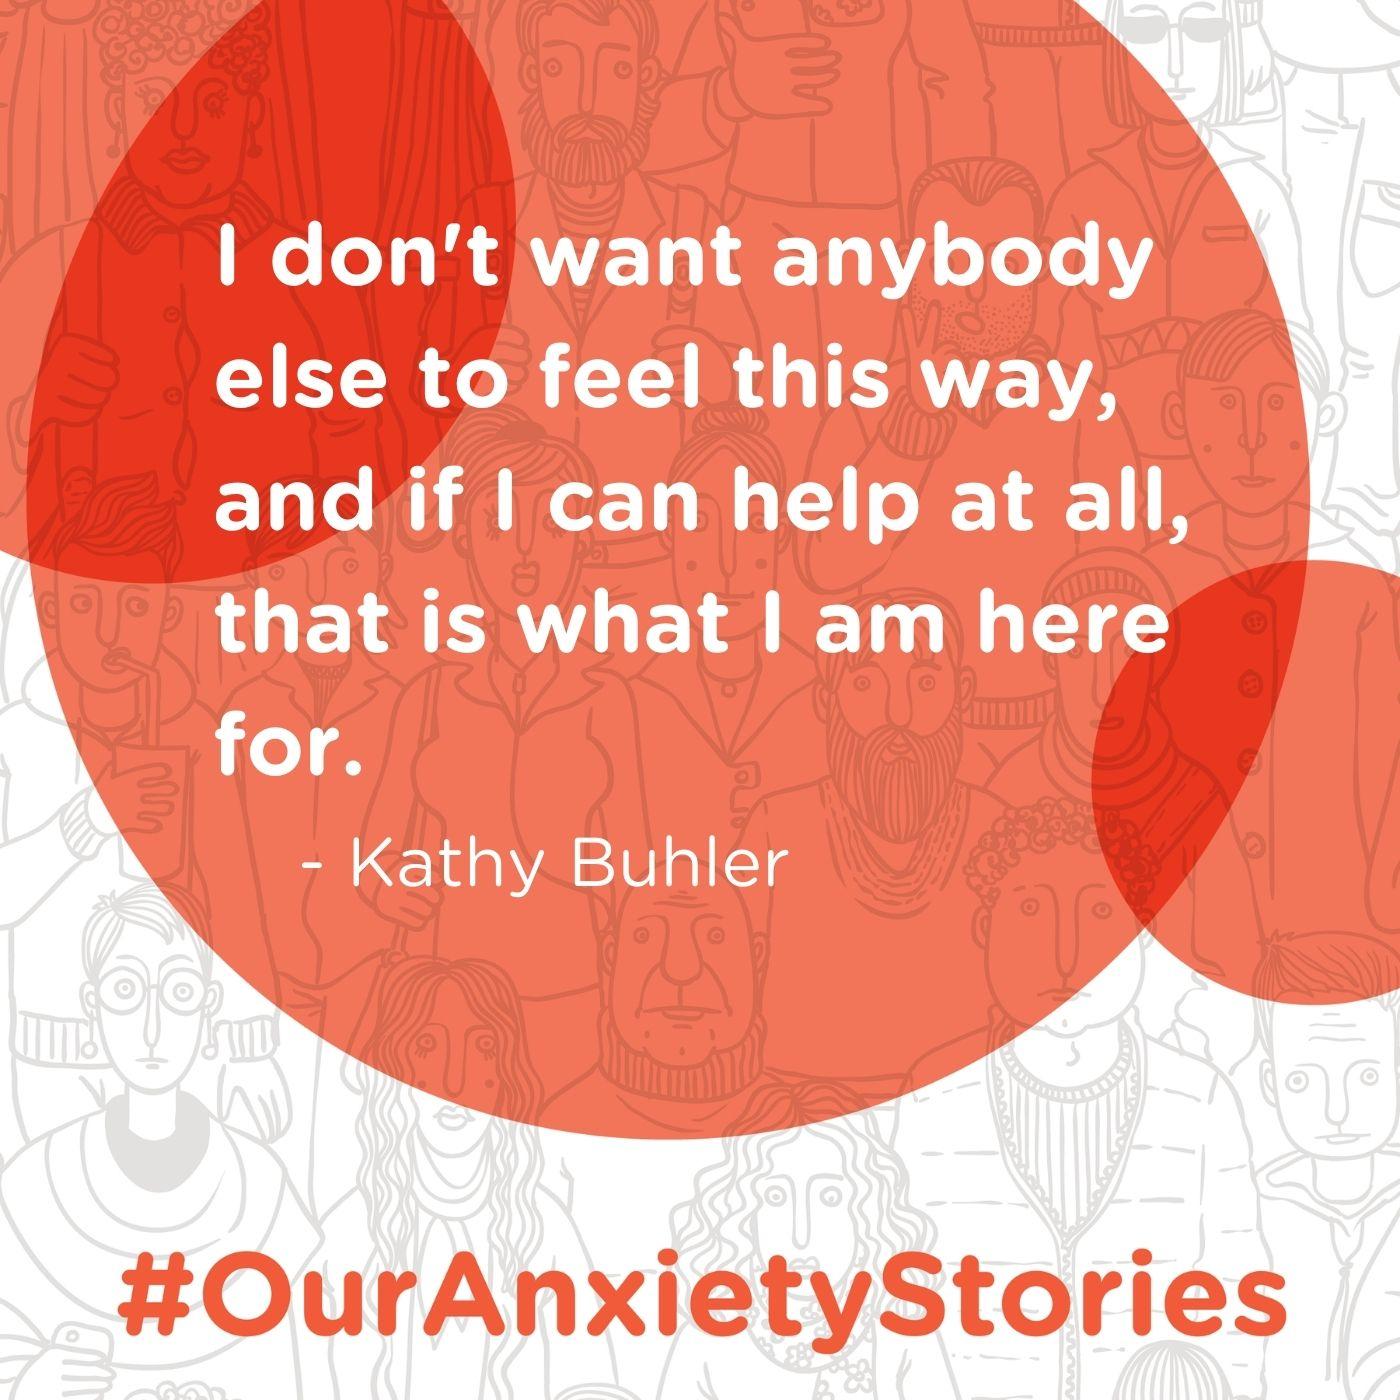 Kathy Buhler